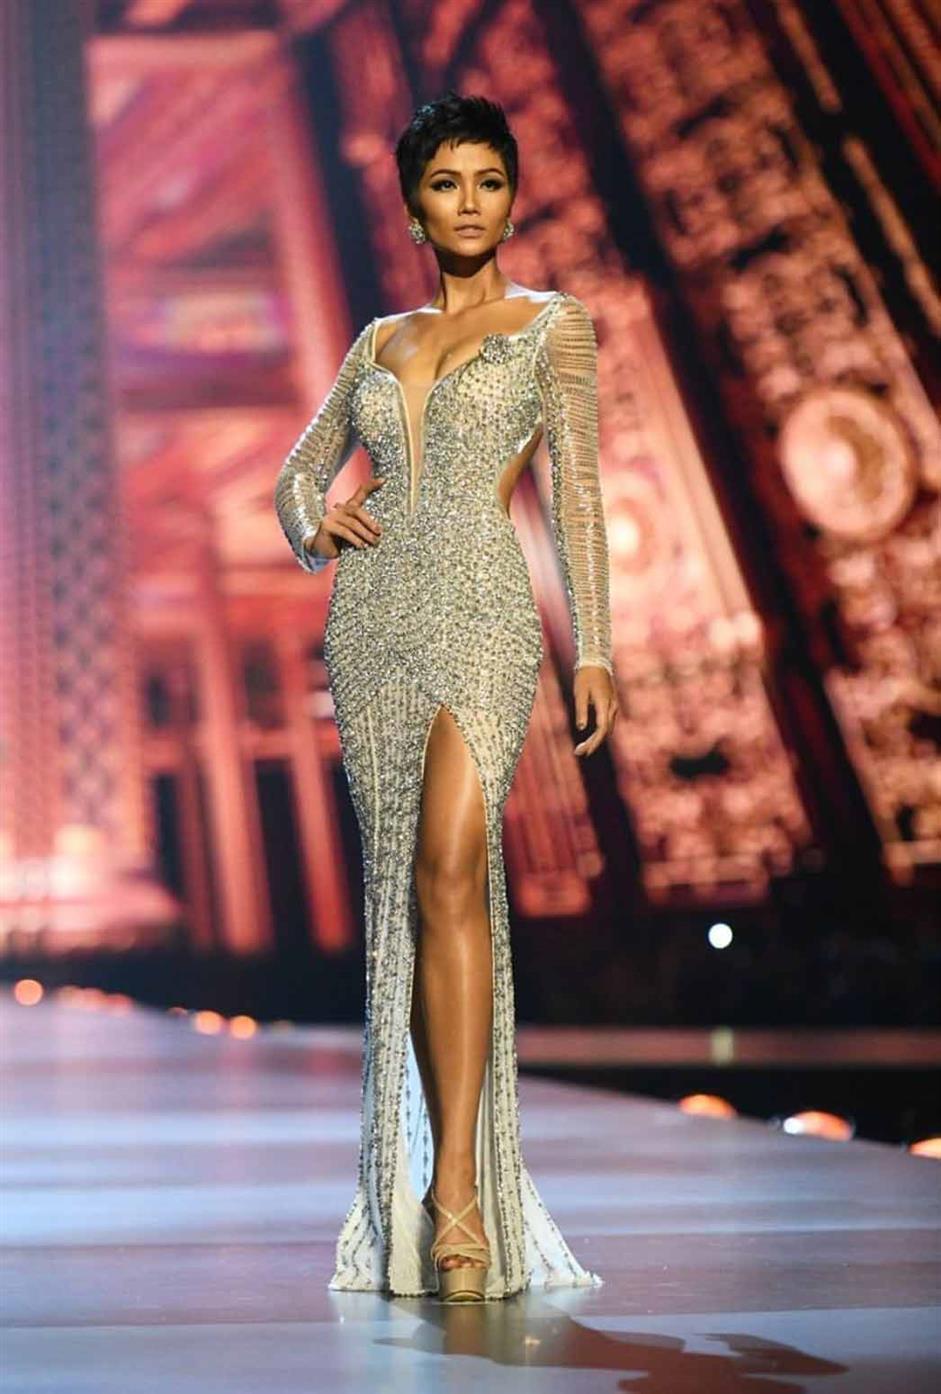 H'Hen Niê represented Vietnam at Miss Universe 2018